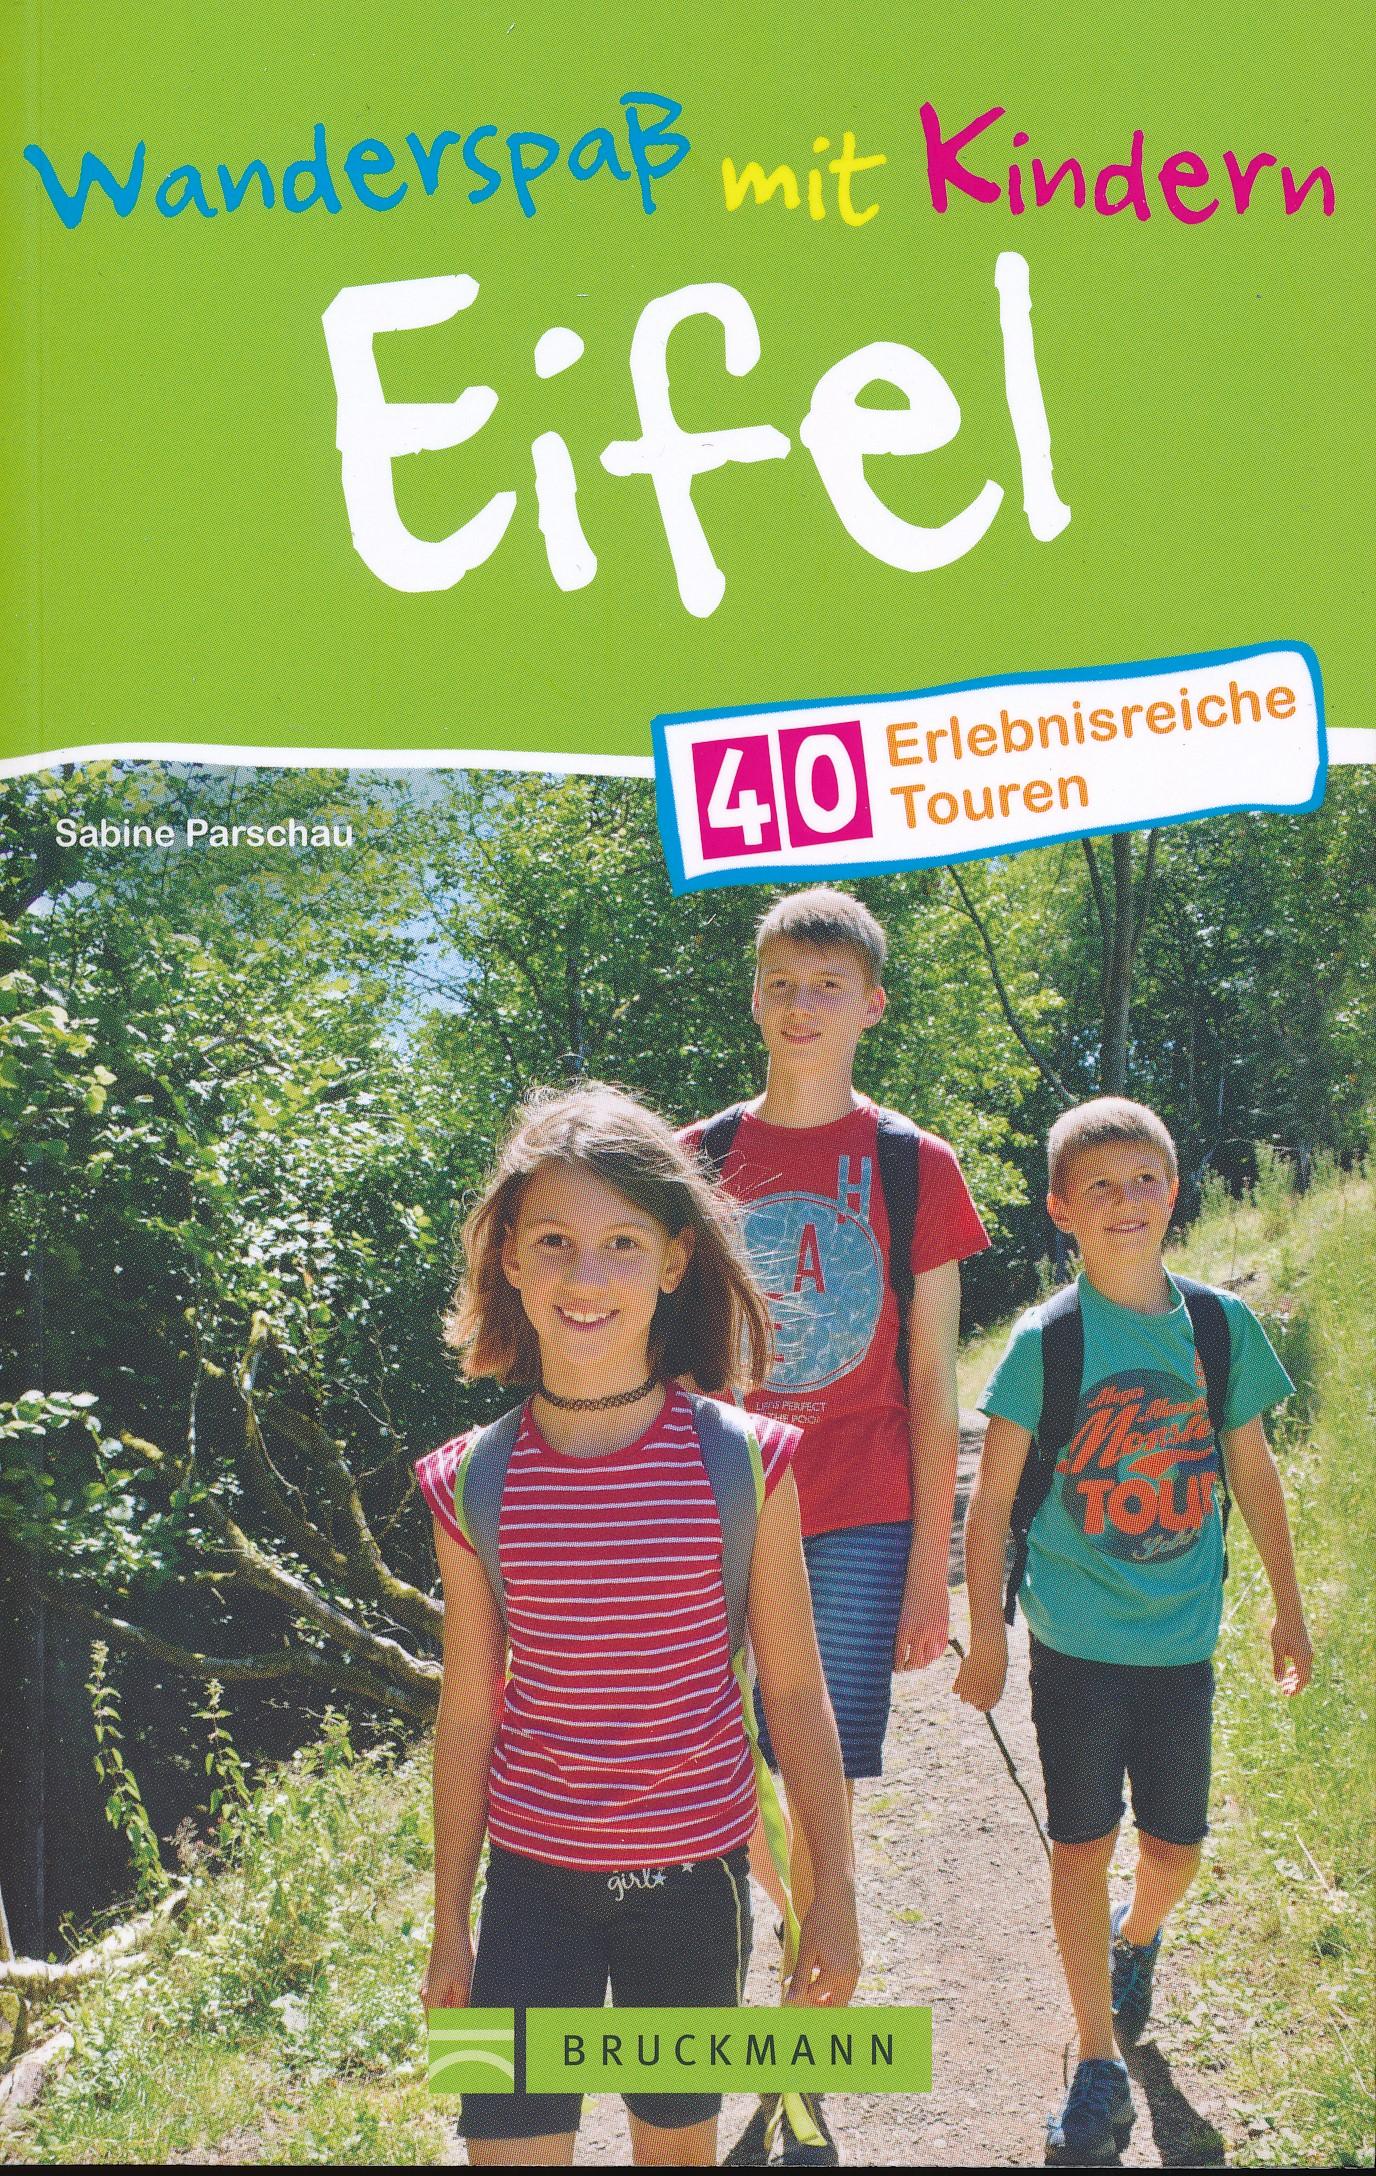 Wandelgids Wanderspass mit Kindern Eifel | Bruckmann